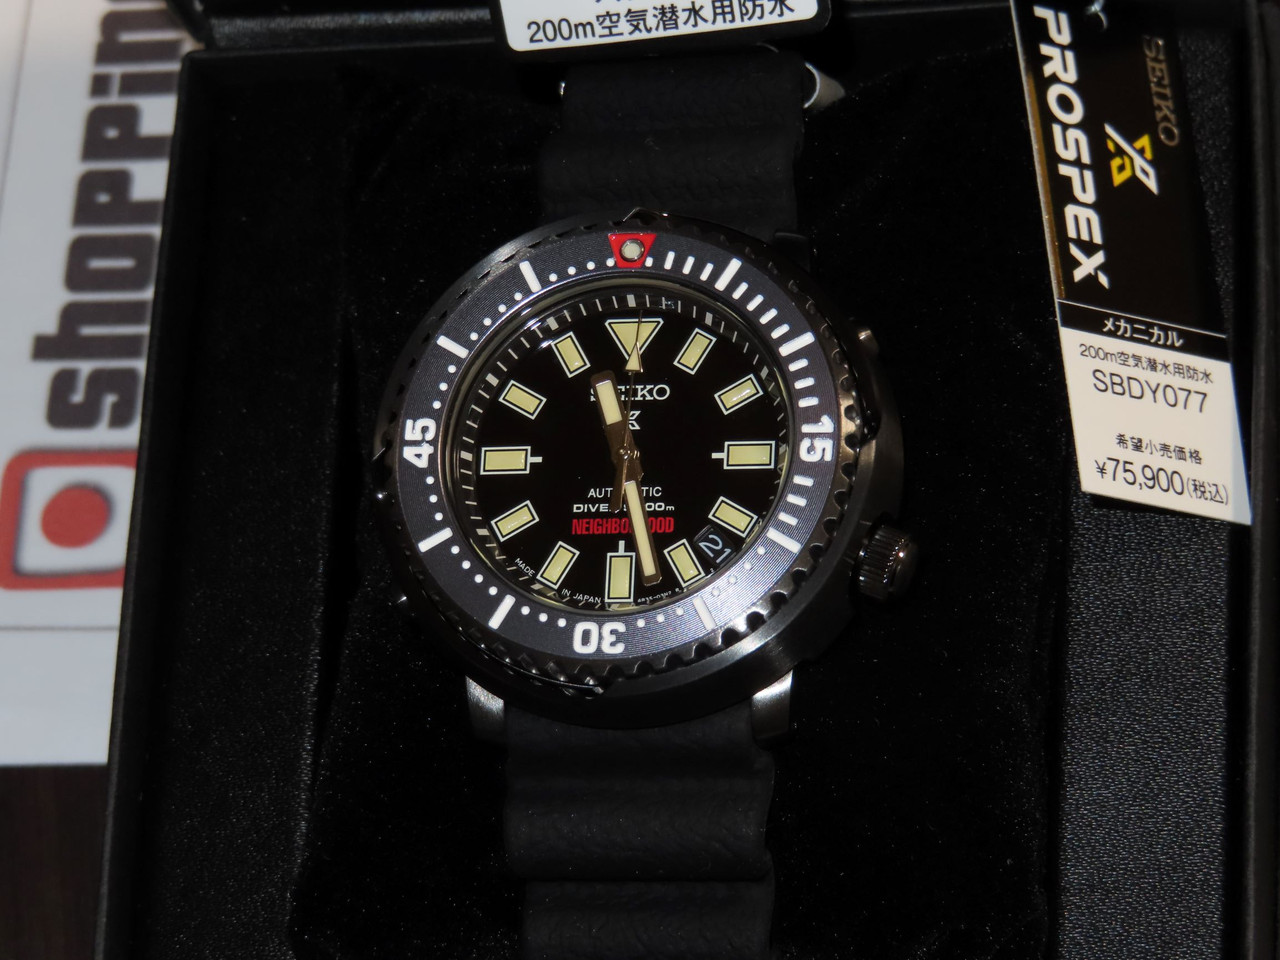 Seiko x Neighborhood Tuna Diver Limited SBDY077